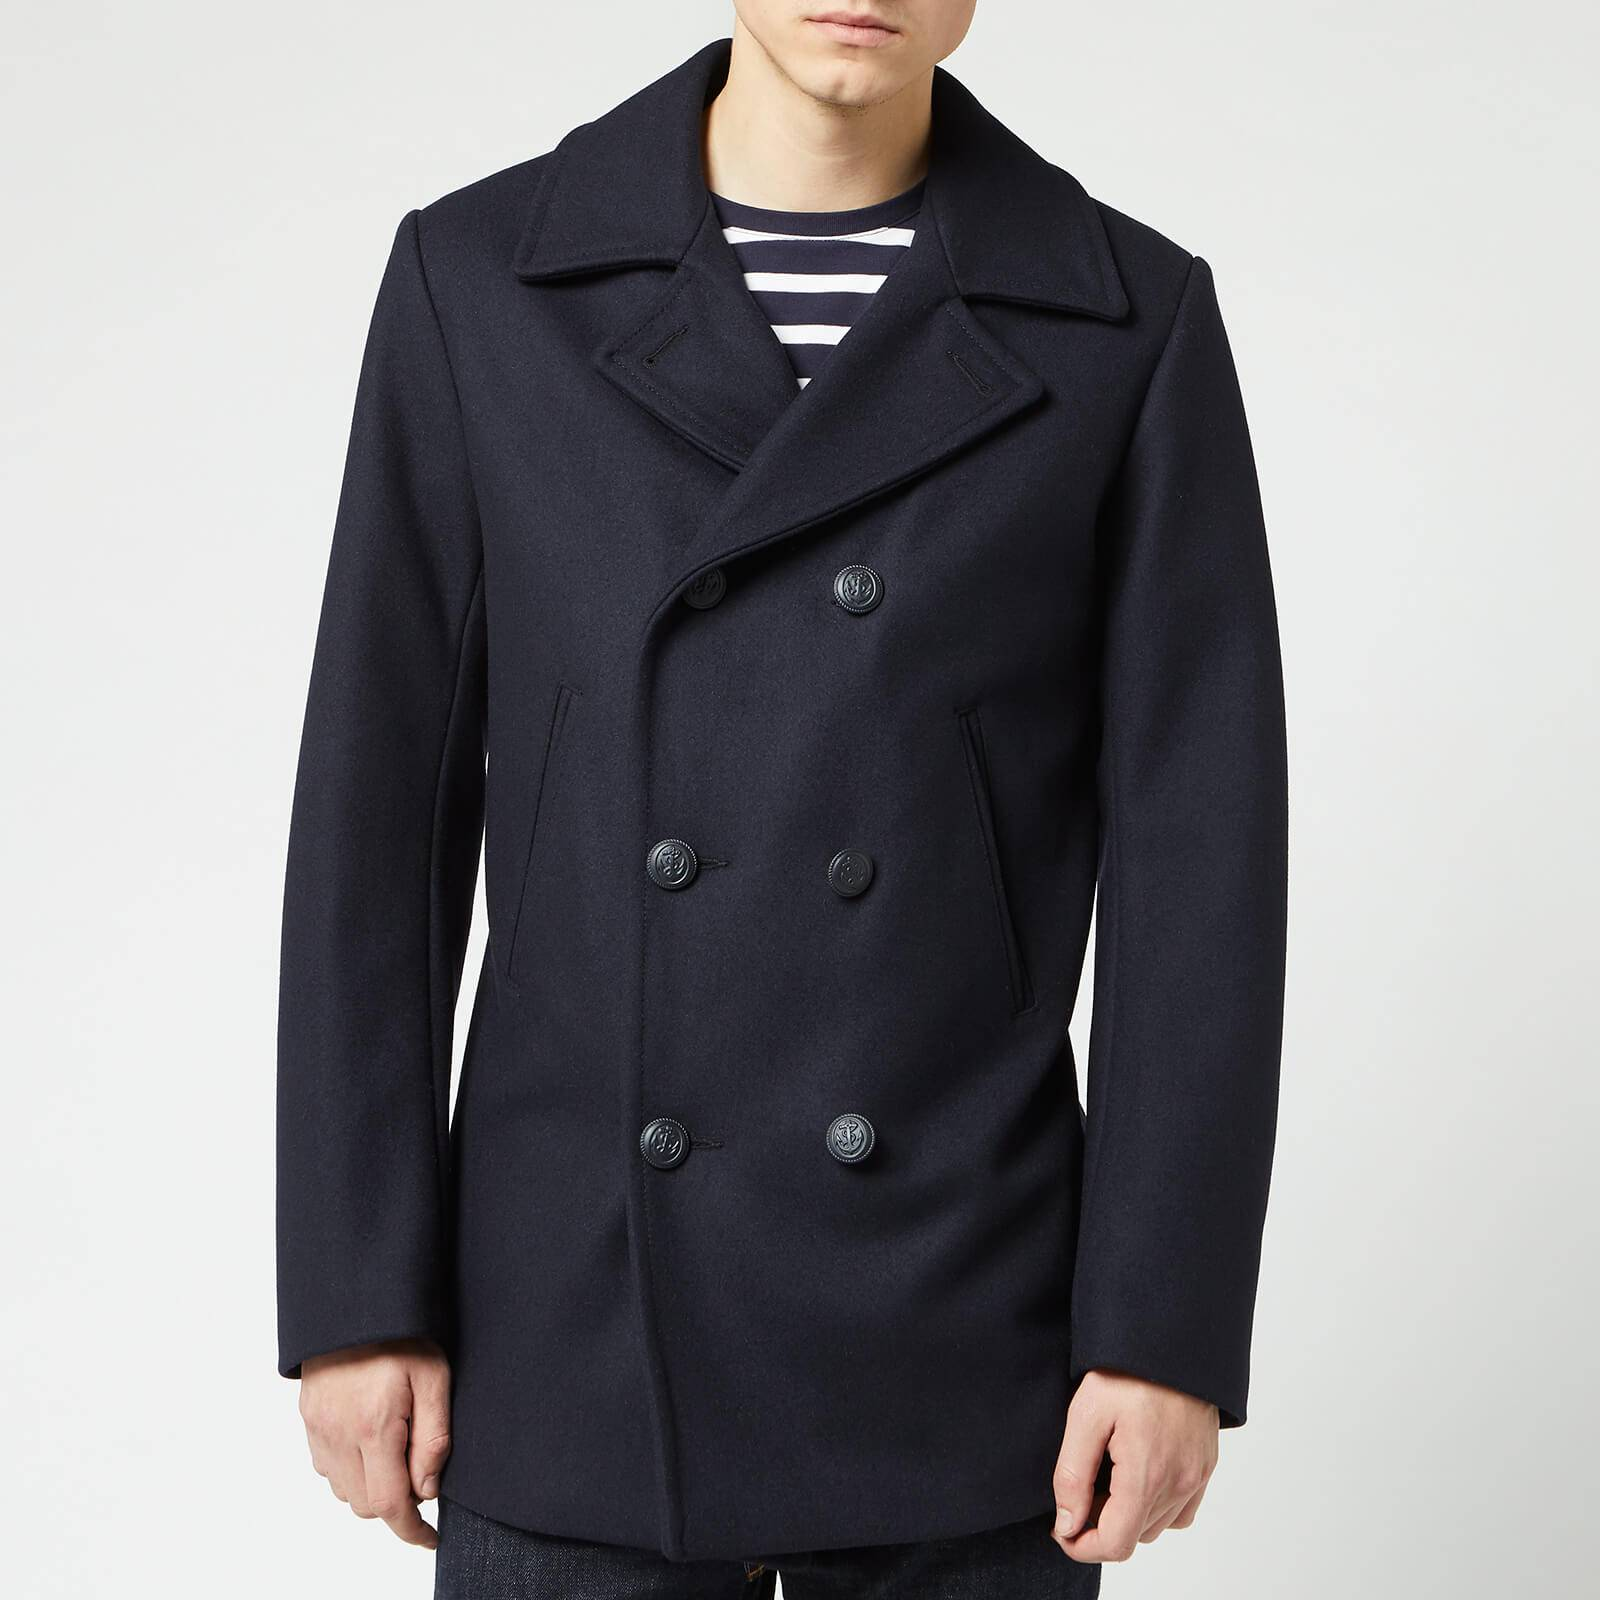 Armor Lux Men's Caban Wool Coat - Navire - EU 38/S - Blue